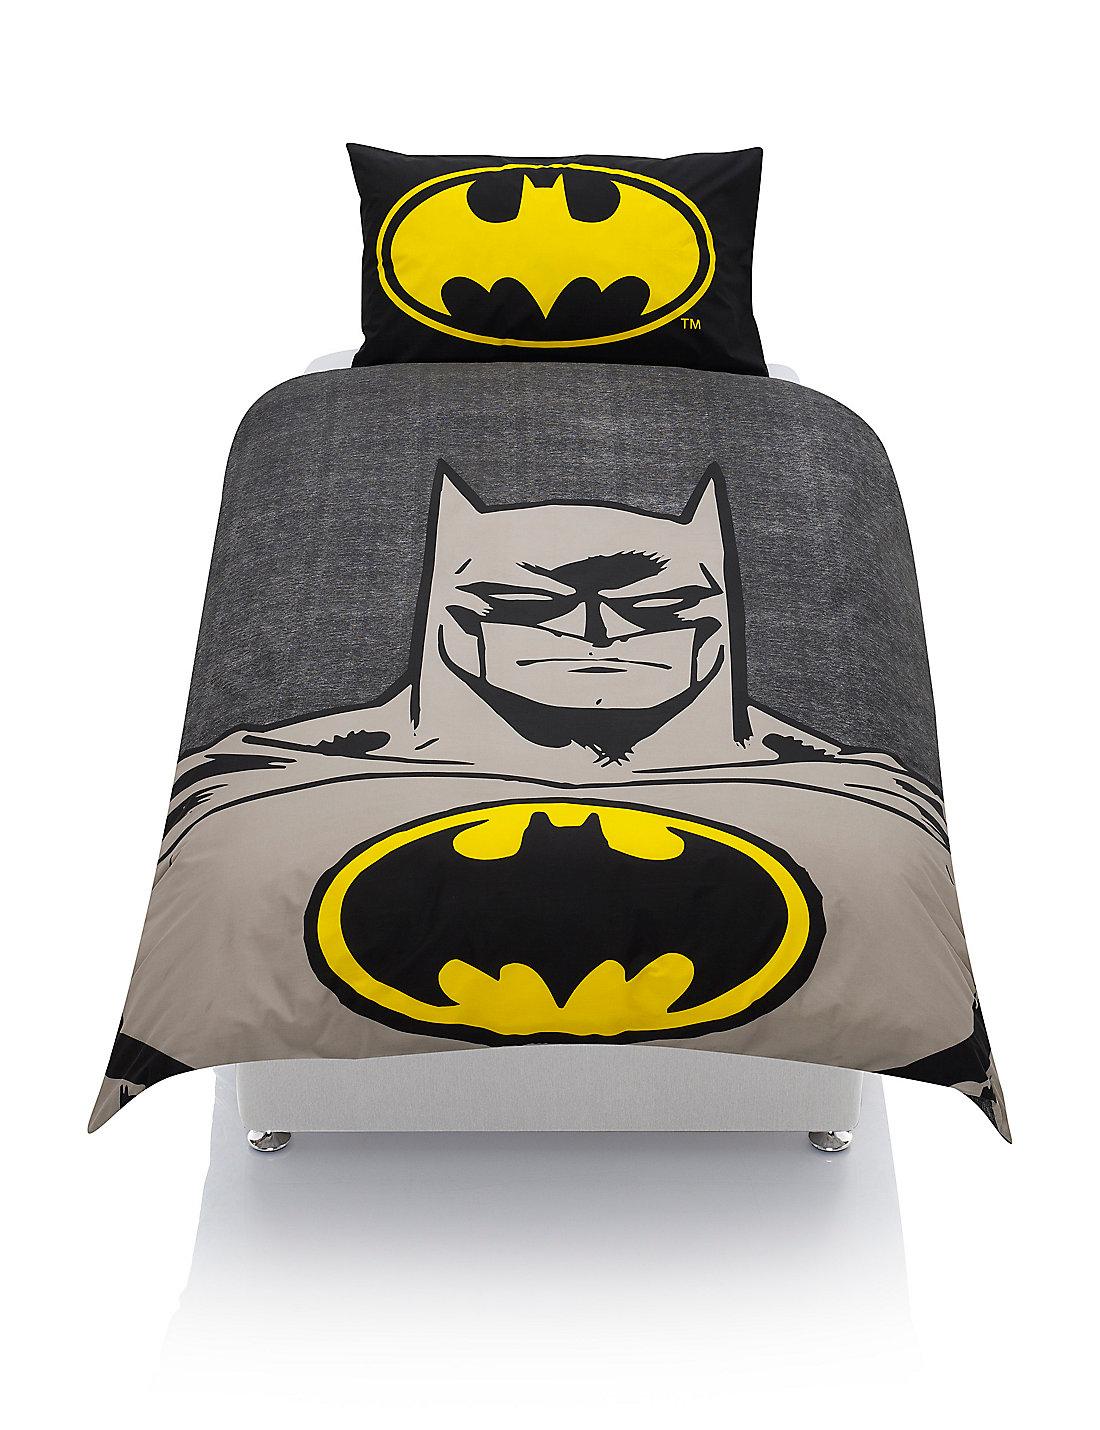 Batman™ Bedding Set